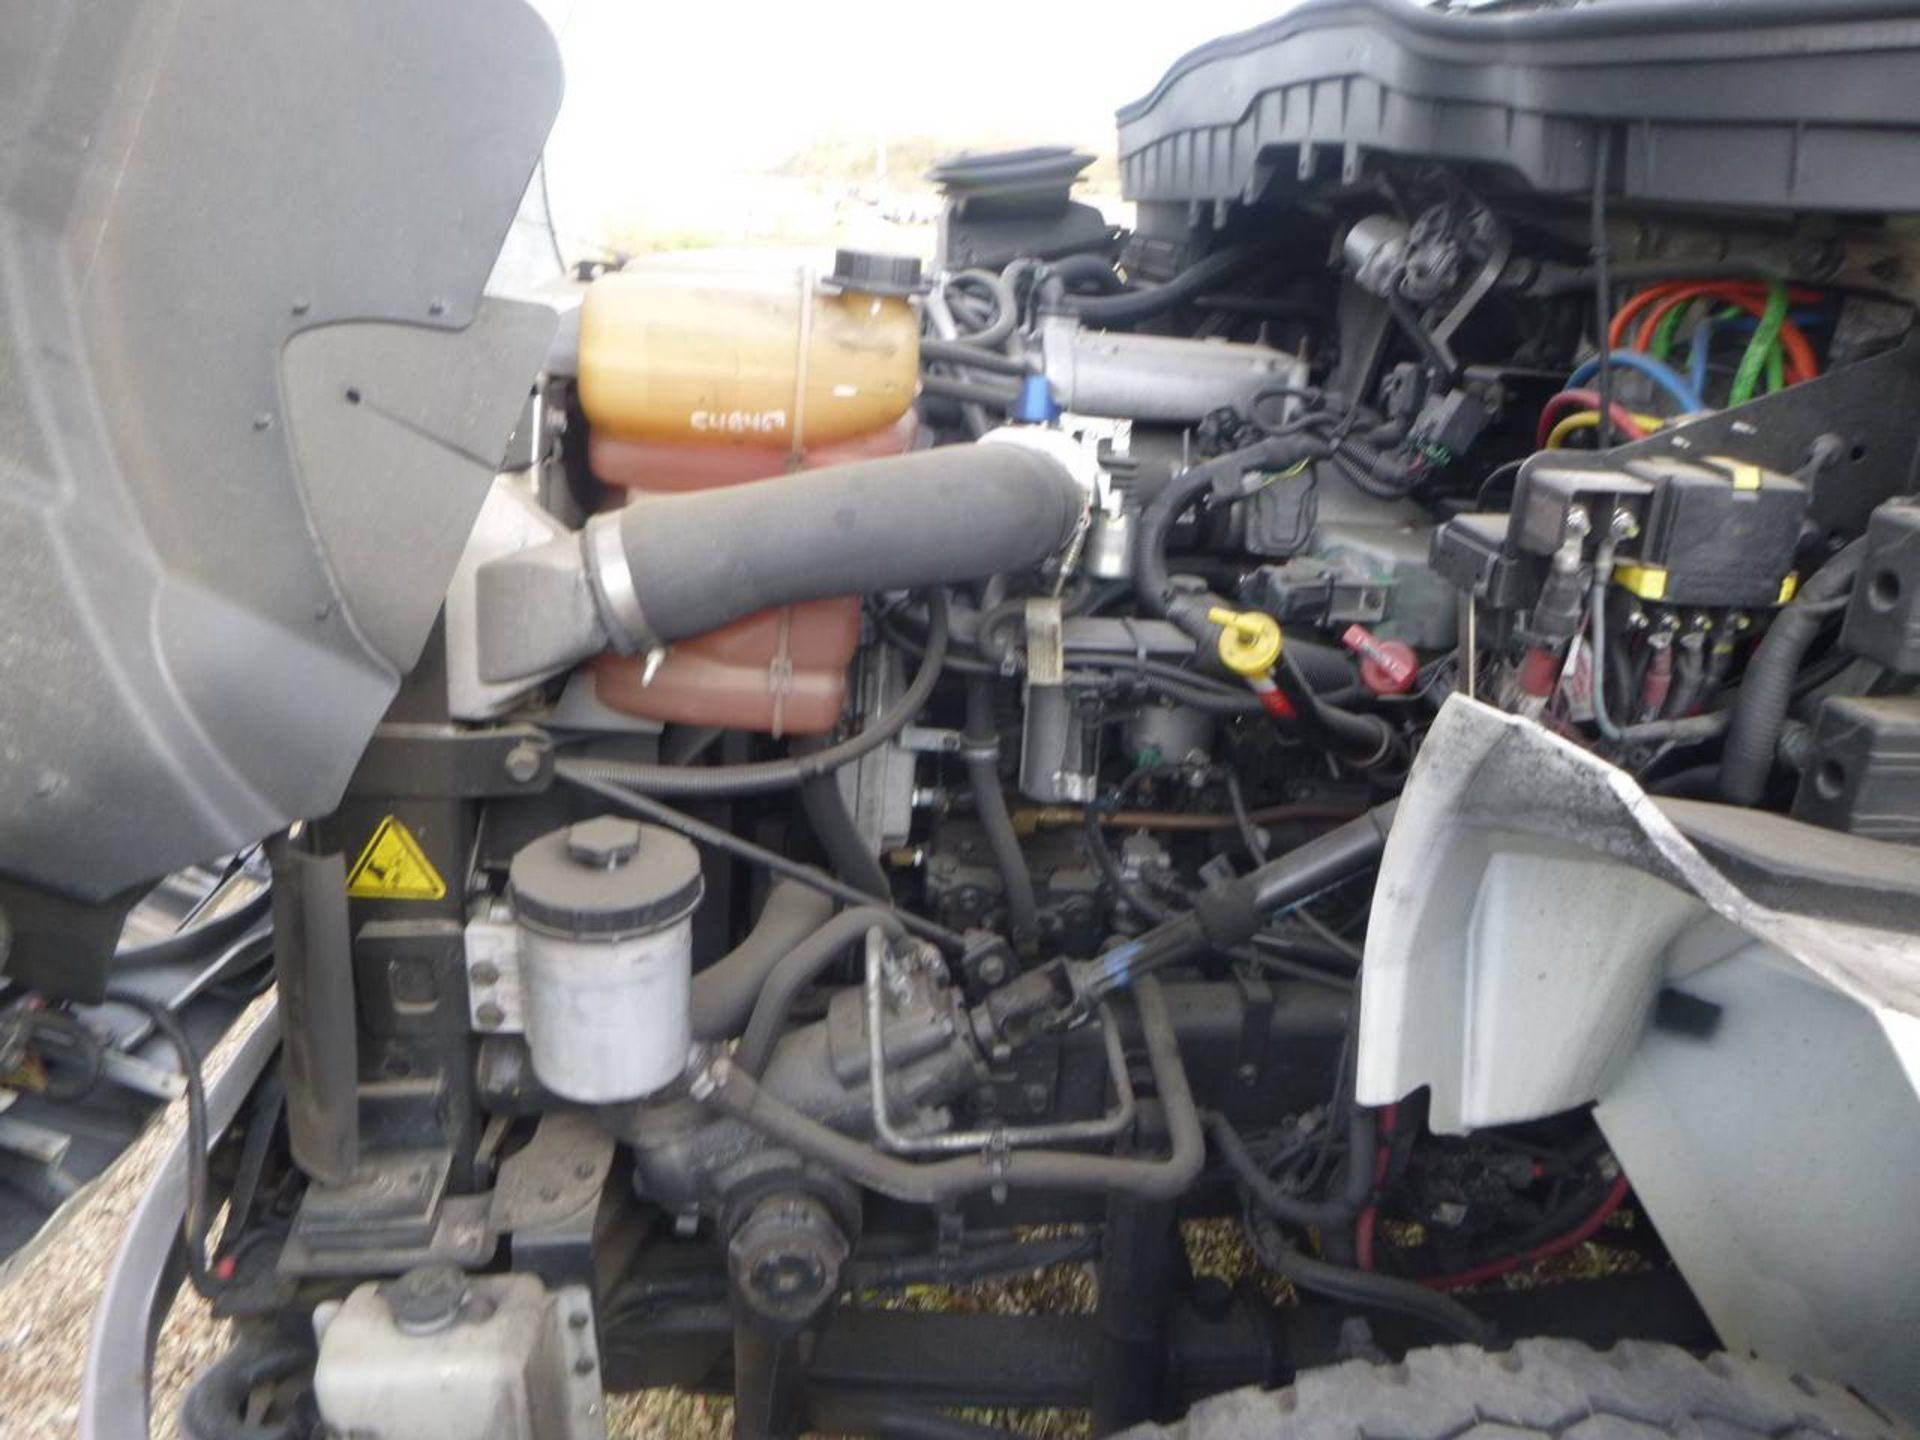 2018 International 4400 SBA 6X4 Dump Truck - Image 10 of 15